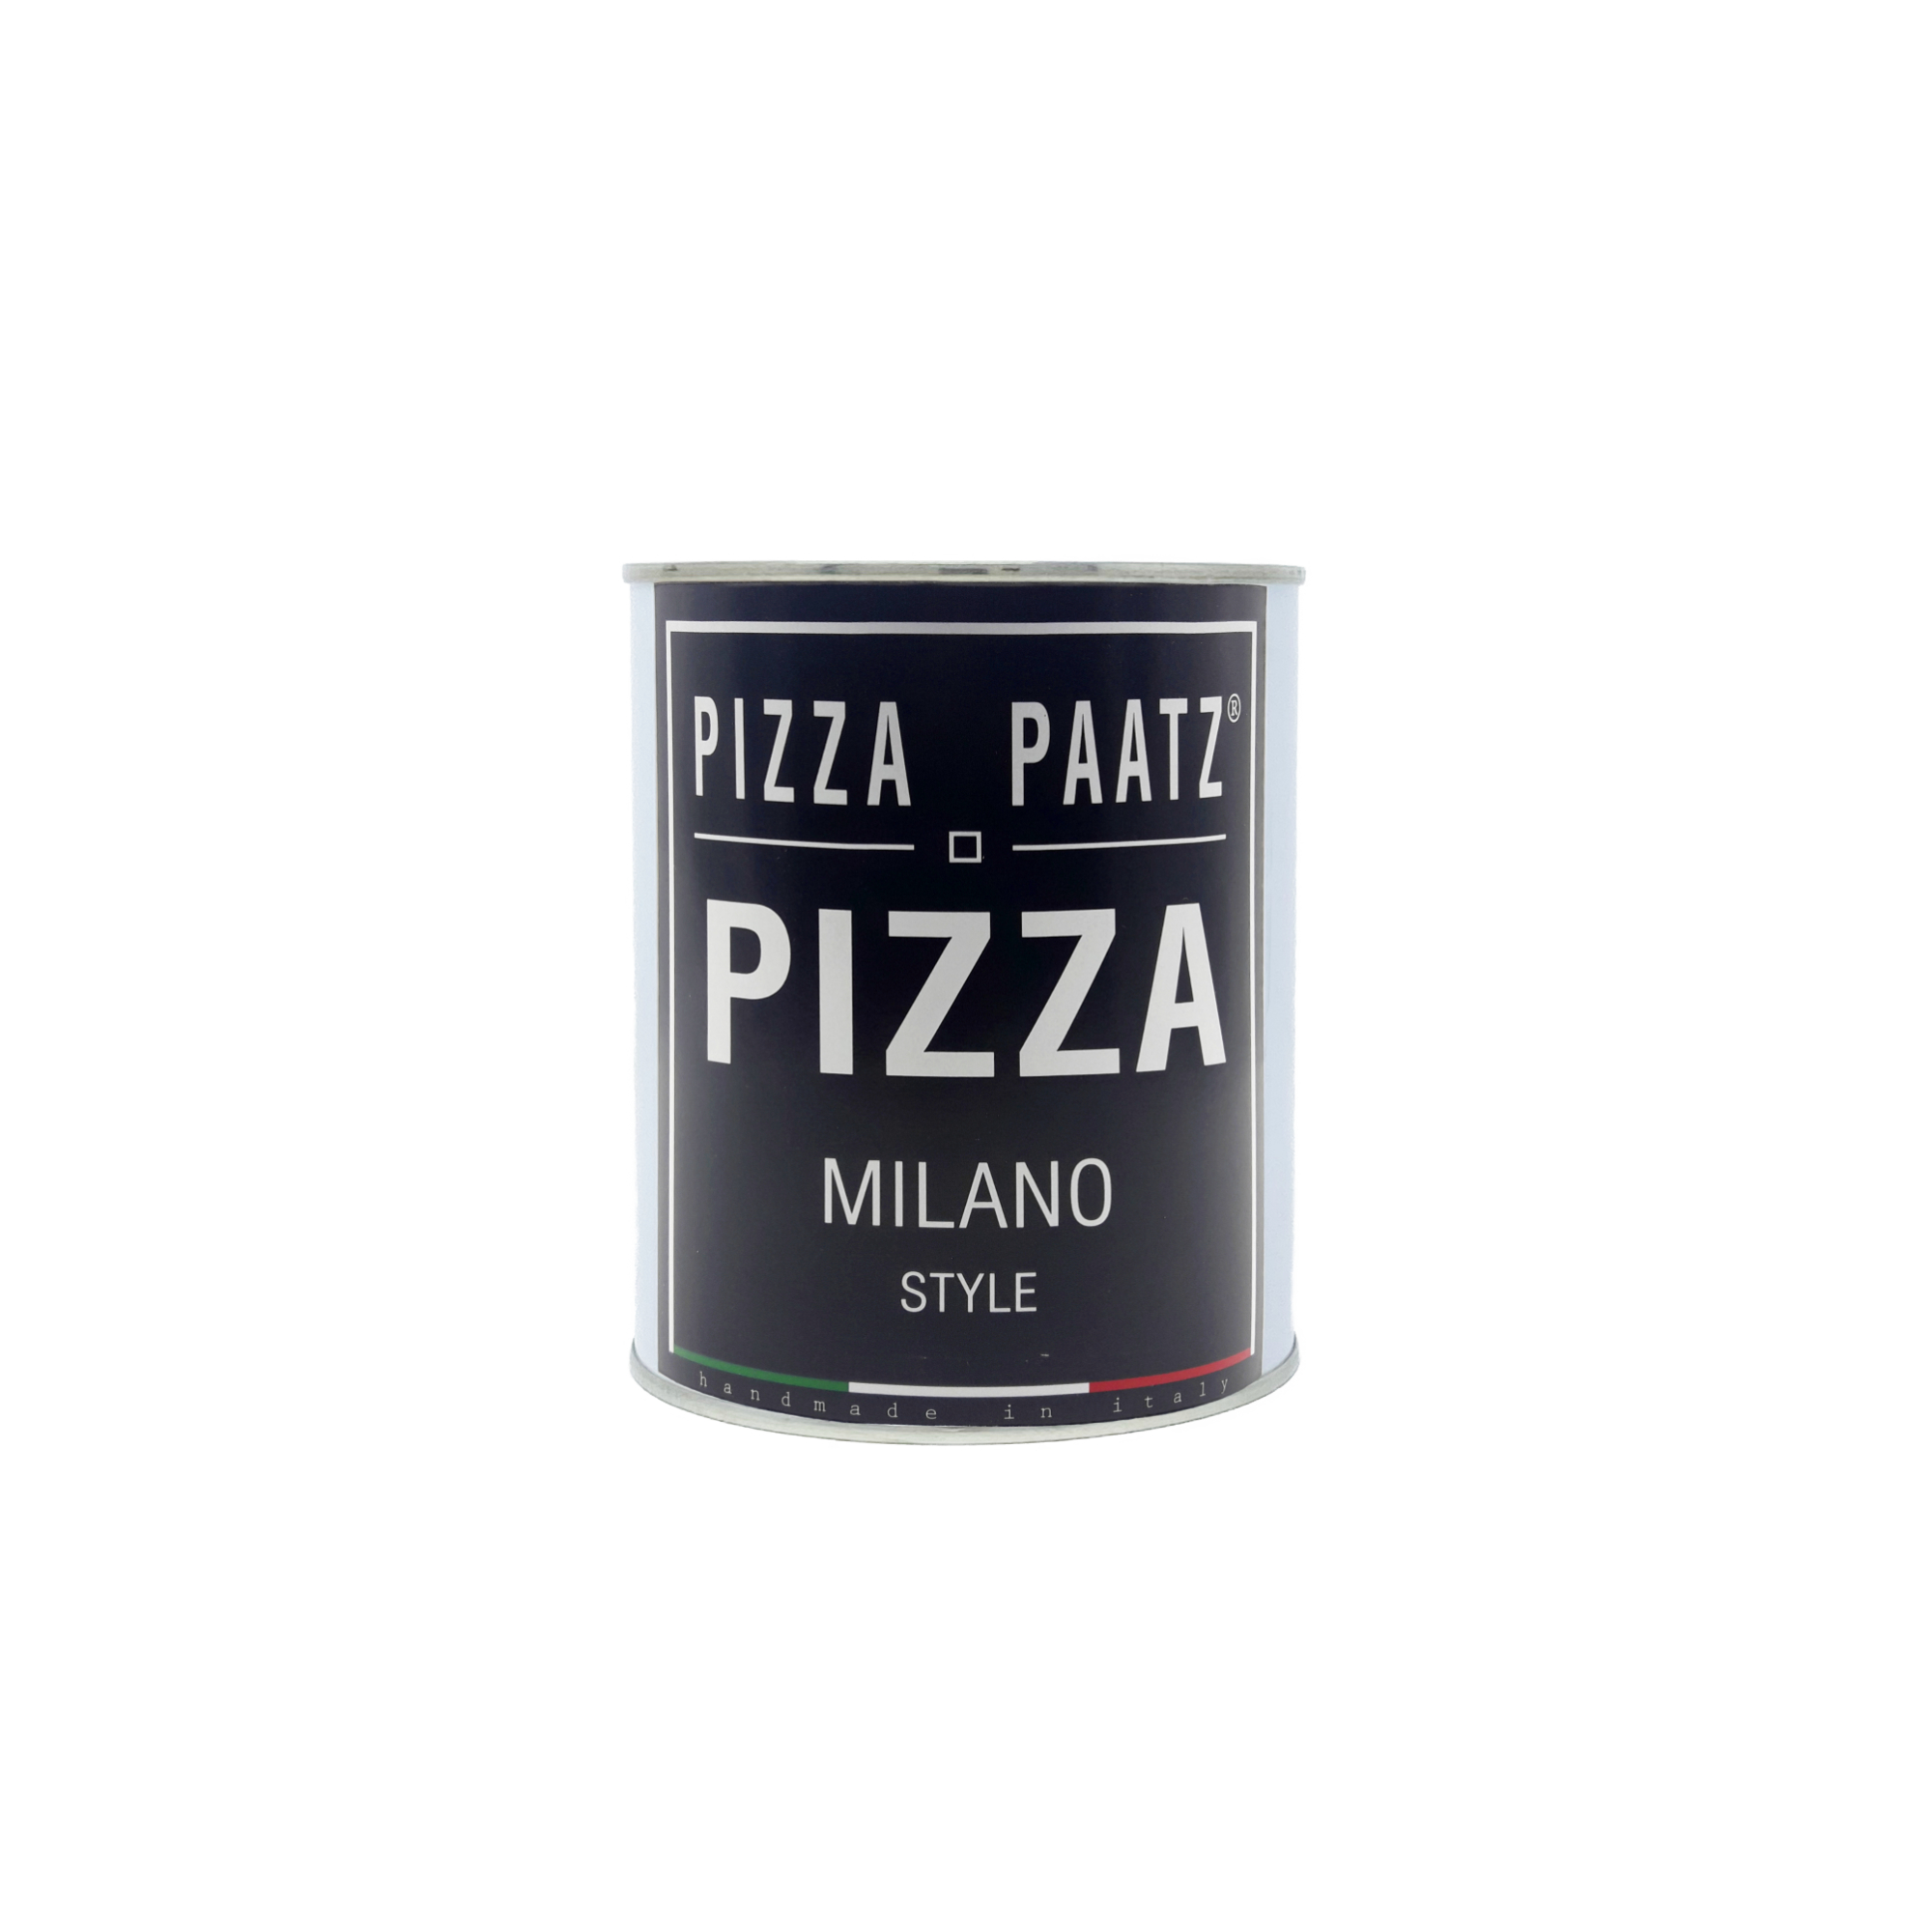 Kit per pizza Milano style